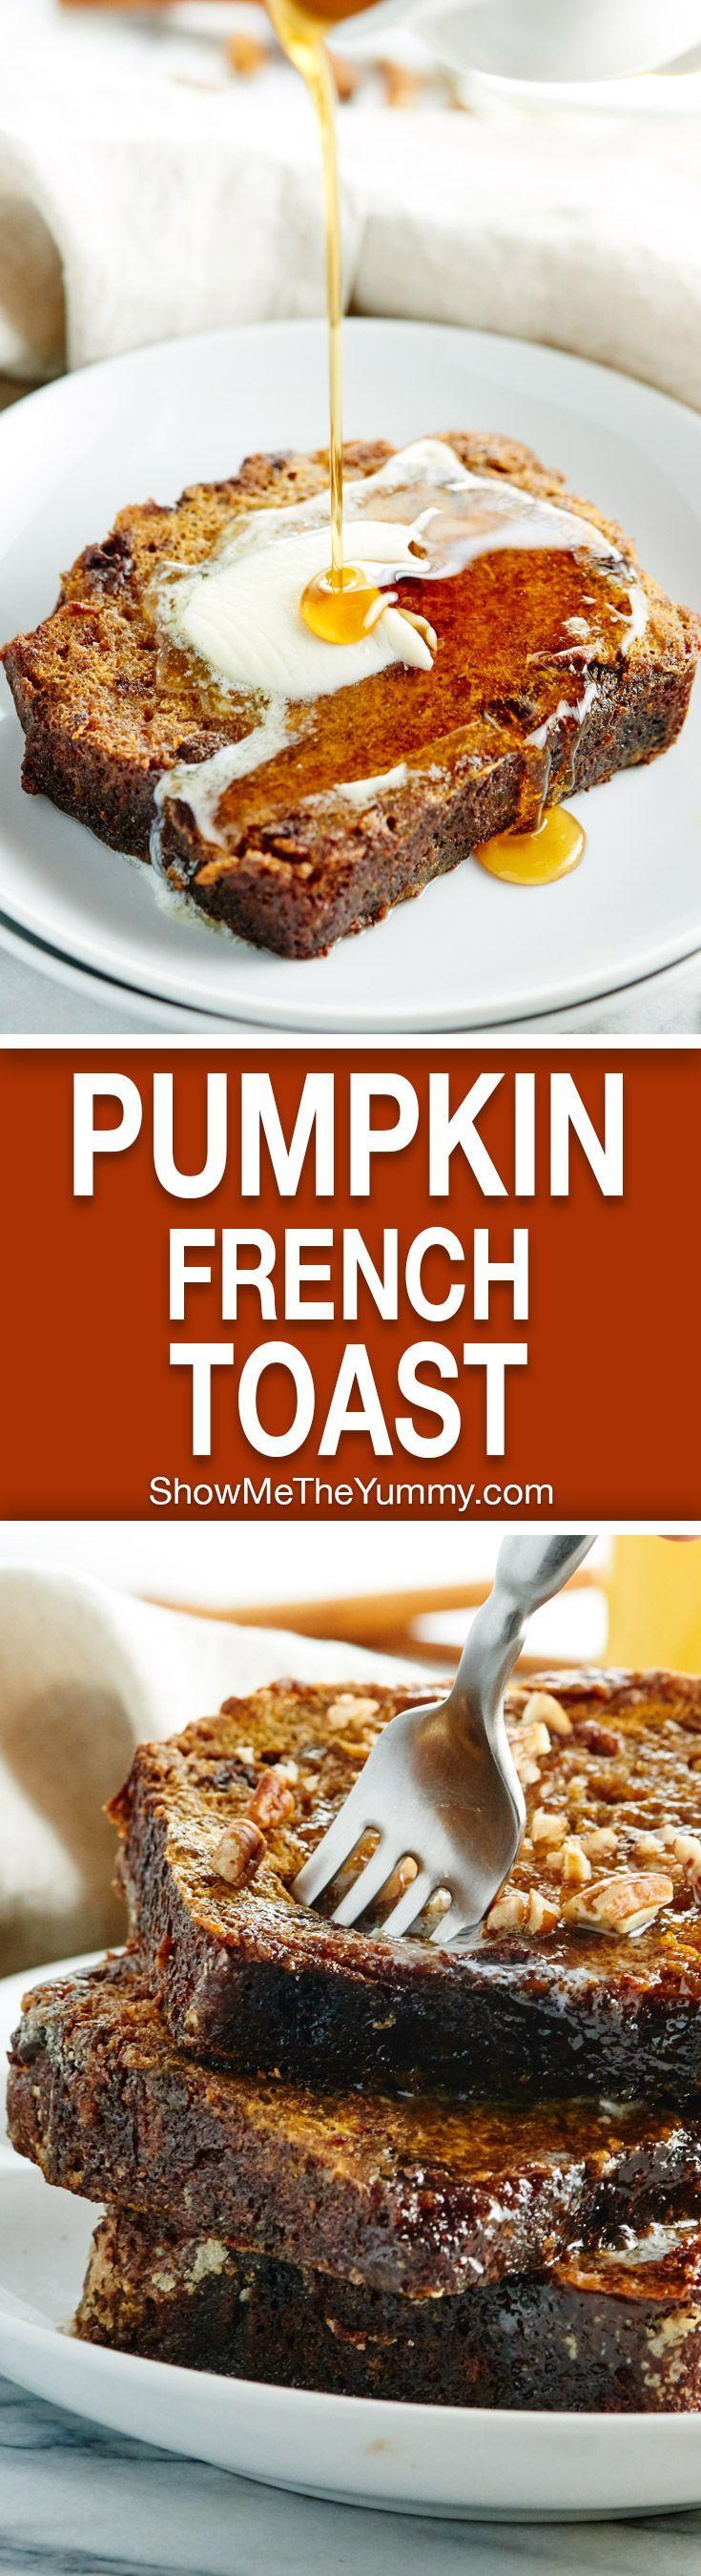 Breakfast Recipes 2016 3 24 Lemon Blueberry Sponge Bread French Toast >> 375 Best Breakfast French Toast Images On Pinterest Conch